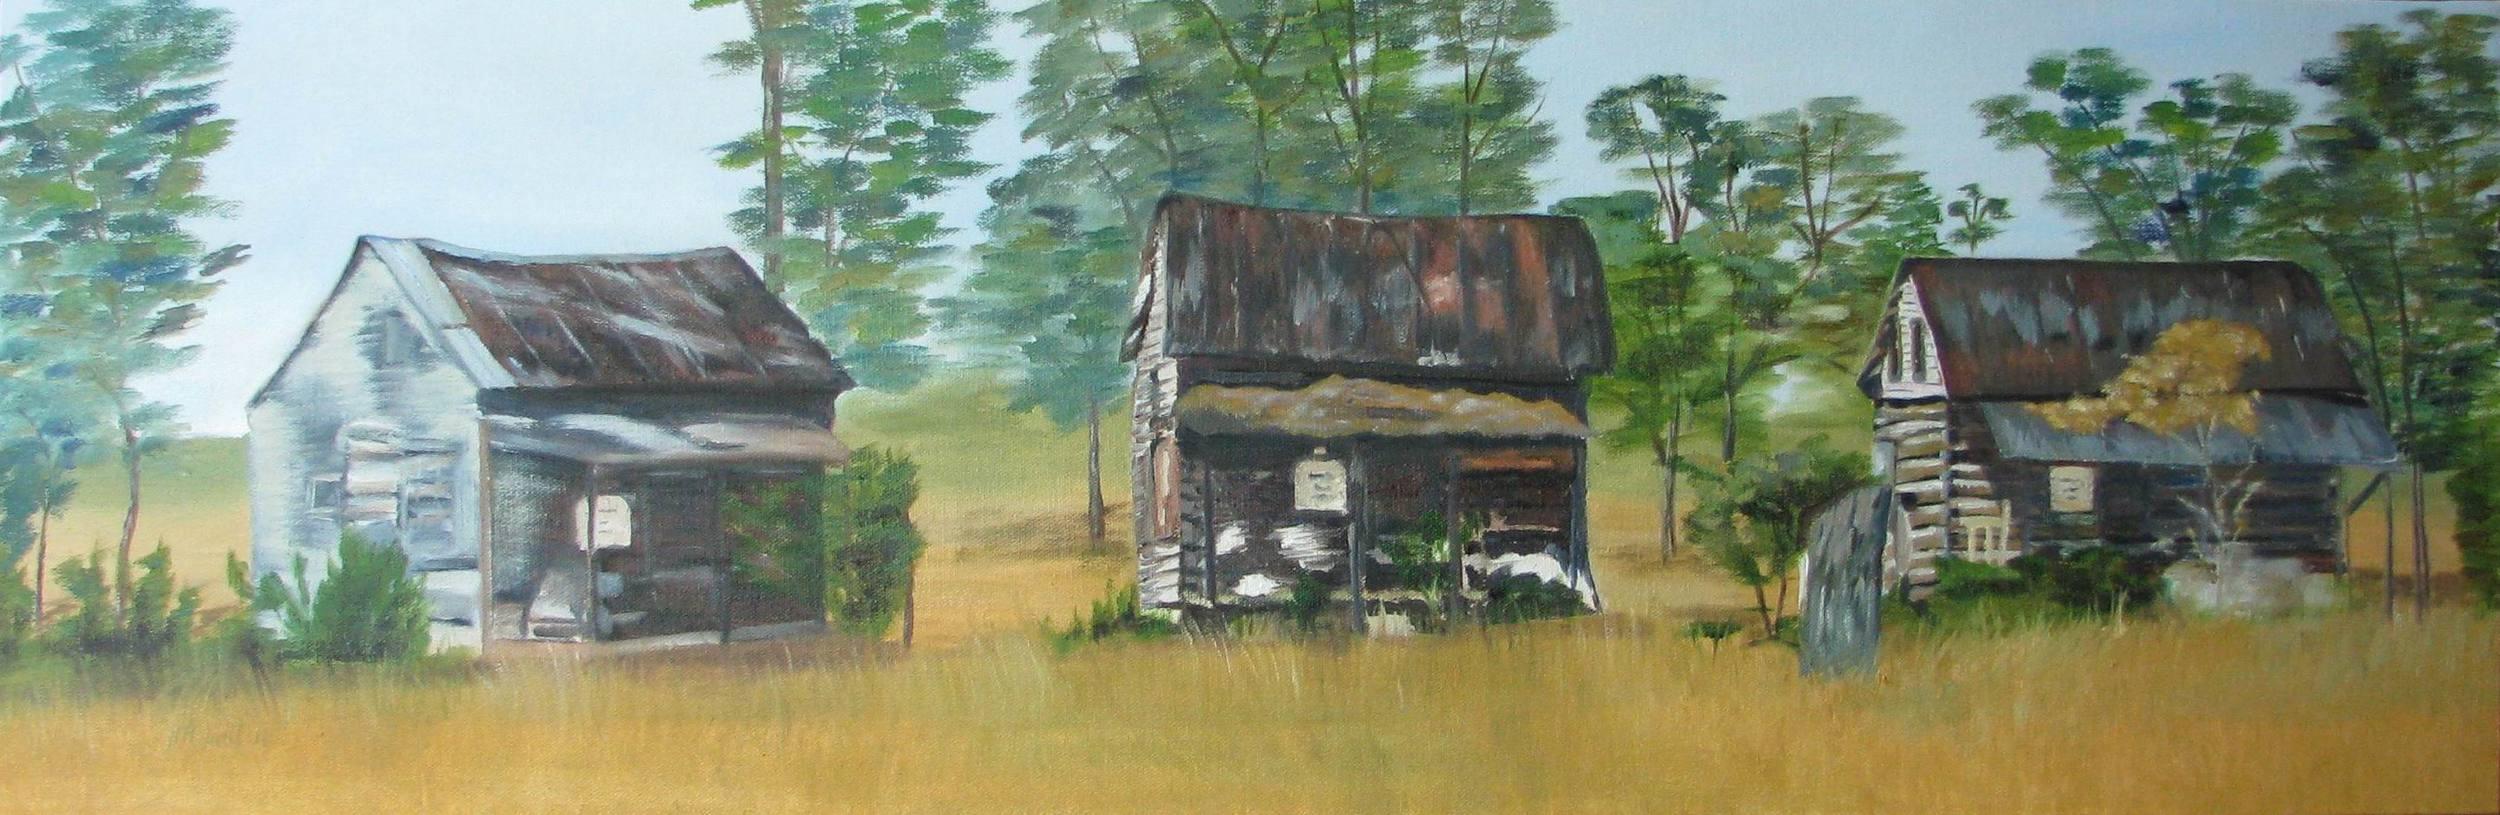 Alabama Slave Houses - 12x36